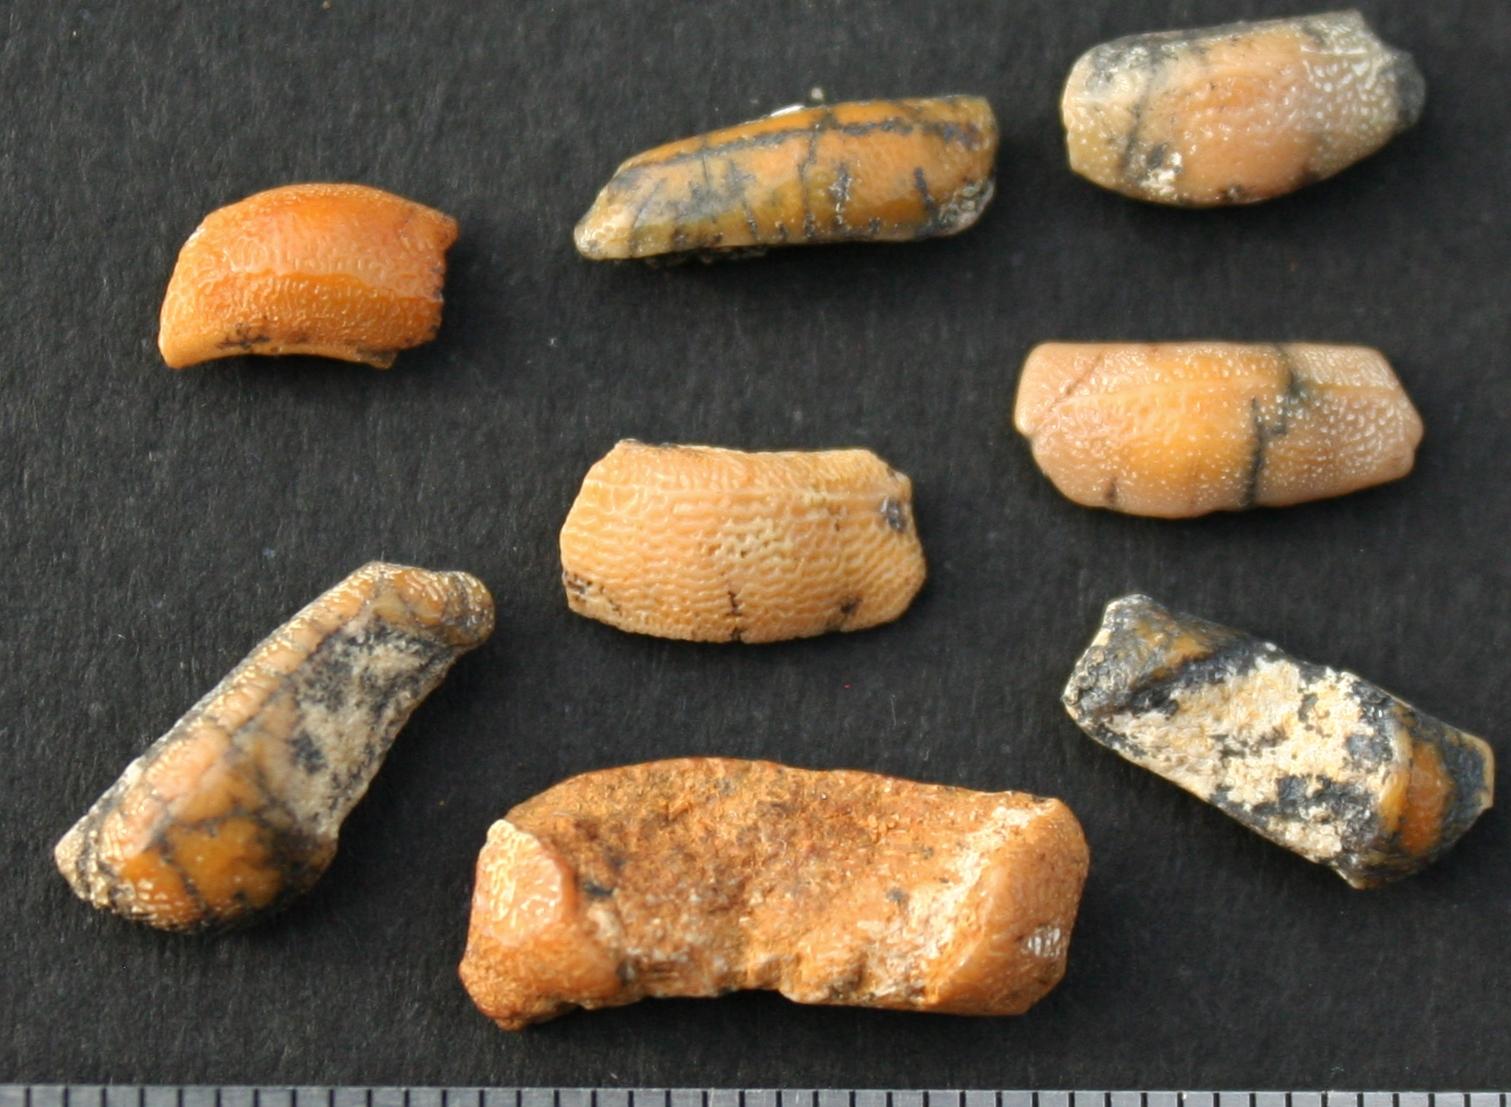 Heterodontus cf .cainozoicus(Bullhead shark)early Pleistocene Loxton Sands Formation South Australia